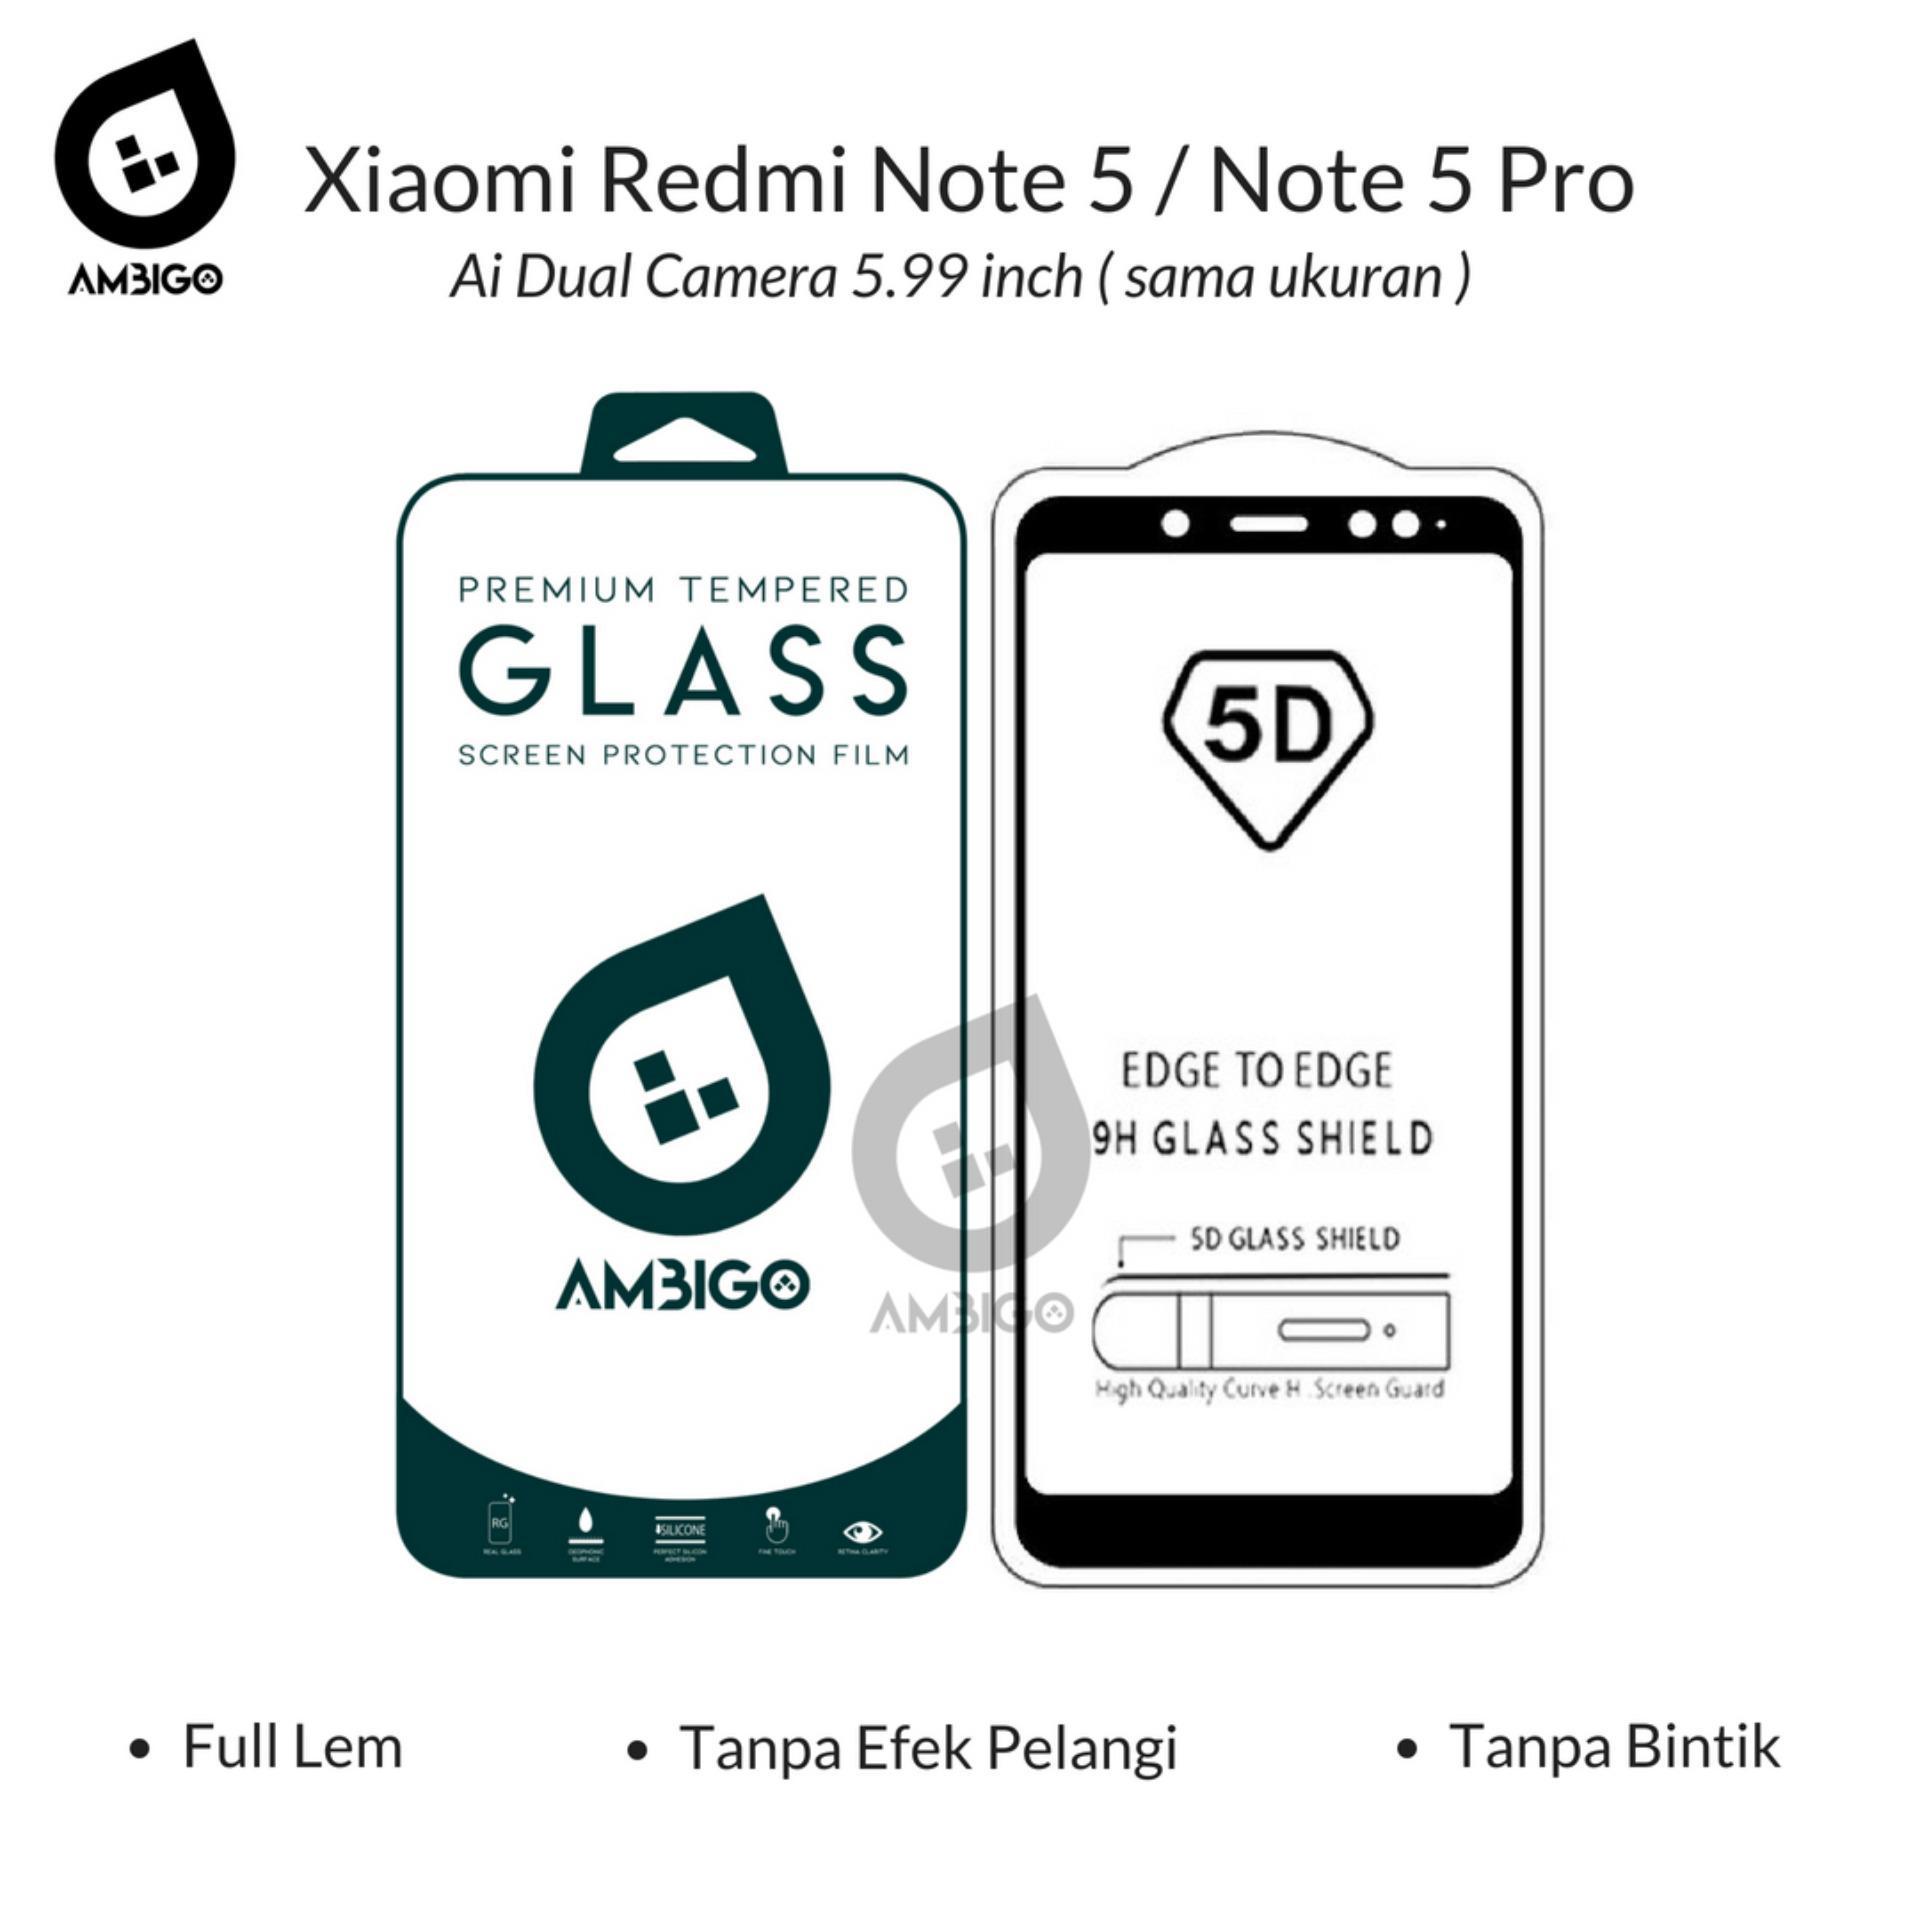 ... Gores Kaca 9H. Source · Ambigo 5D Tempered Glass Screen Protector Xiaomi Redmi Note 5, Redmi Note 5 Pro Ai